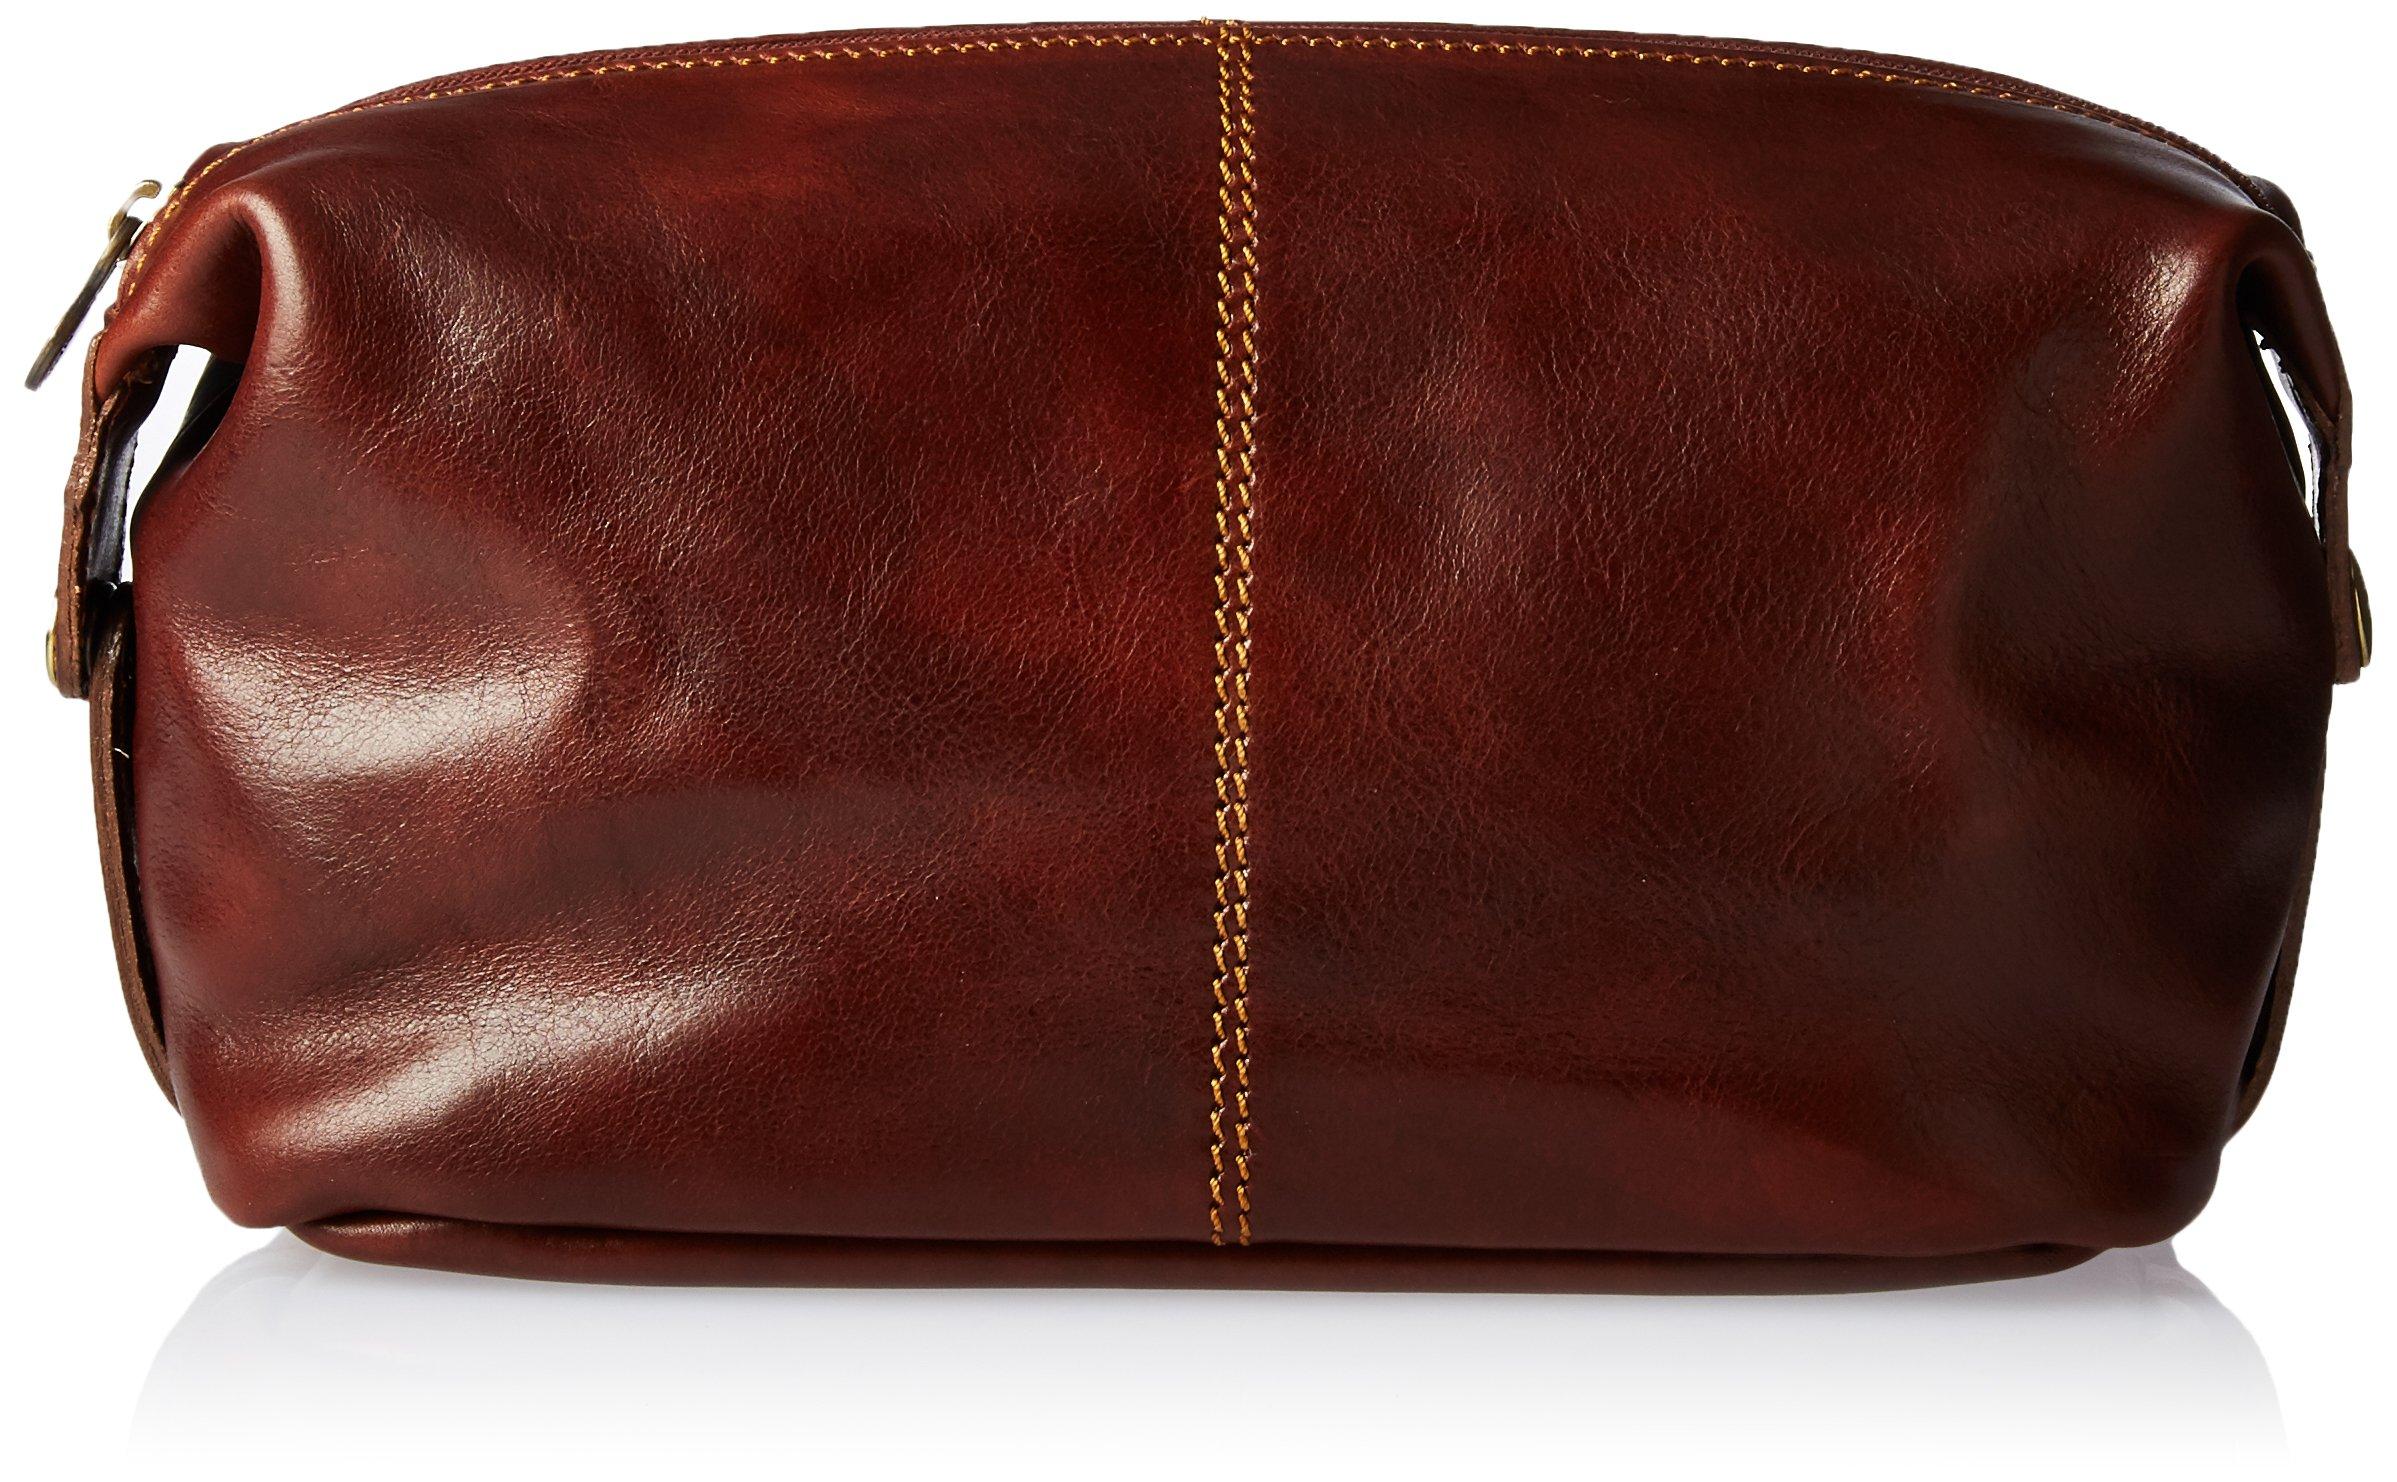 Alberto Bellucci Men's Italian Leather Toiletry Travel Dopp Kit Case, Brown